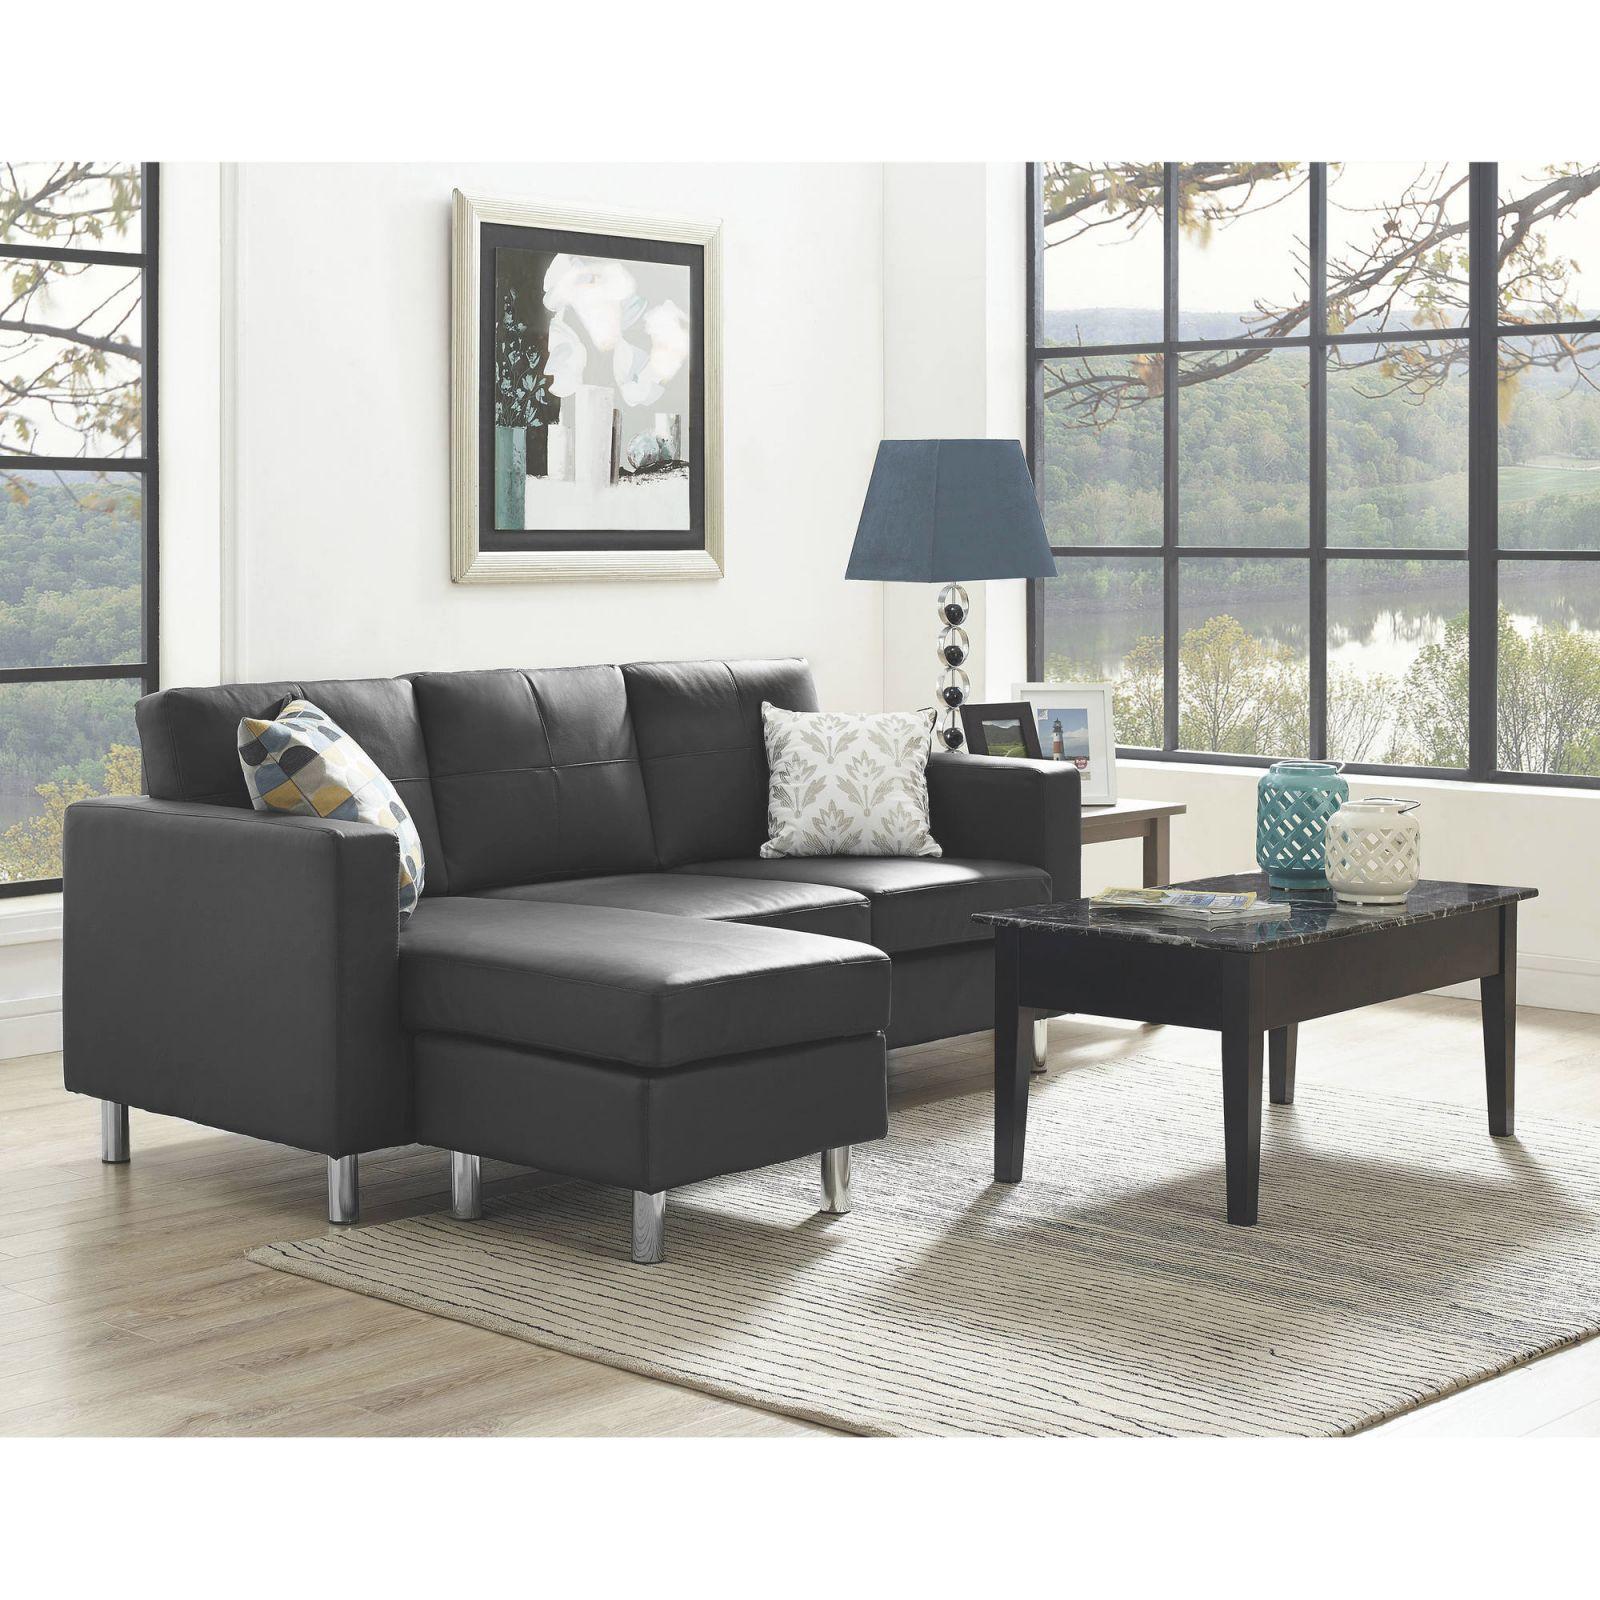 Small Spaces Living Room Value Bundle – Walmart in Small Space Living Room Furniture